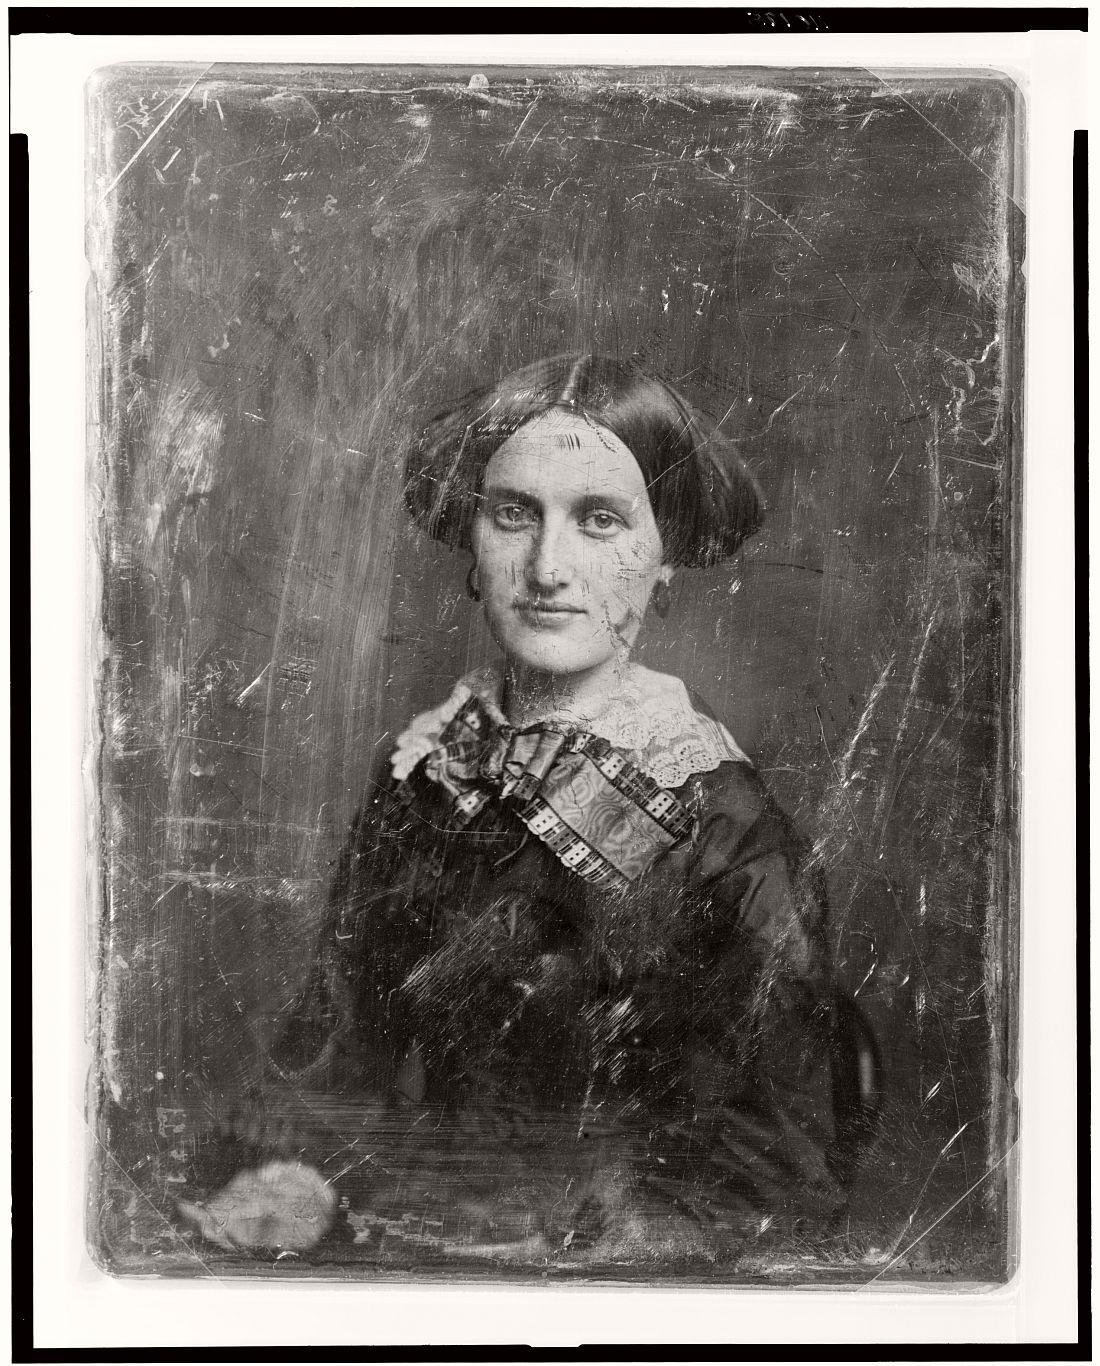 vintage-daguerreotype-portraits-from-xix-century-1844-1860-67